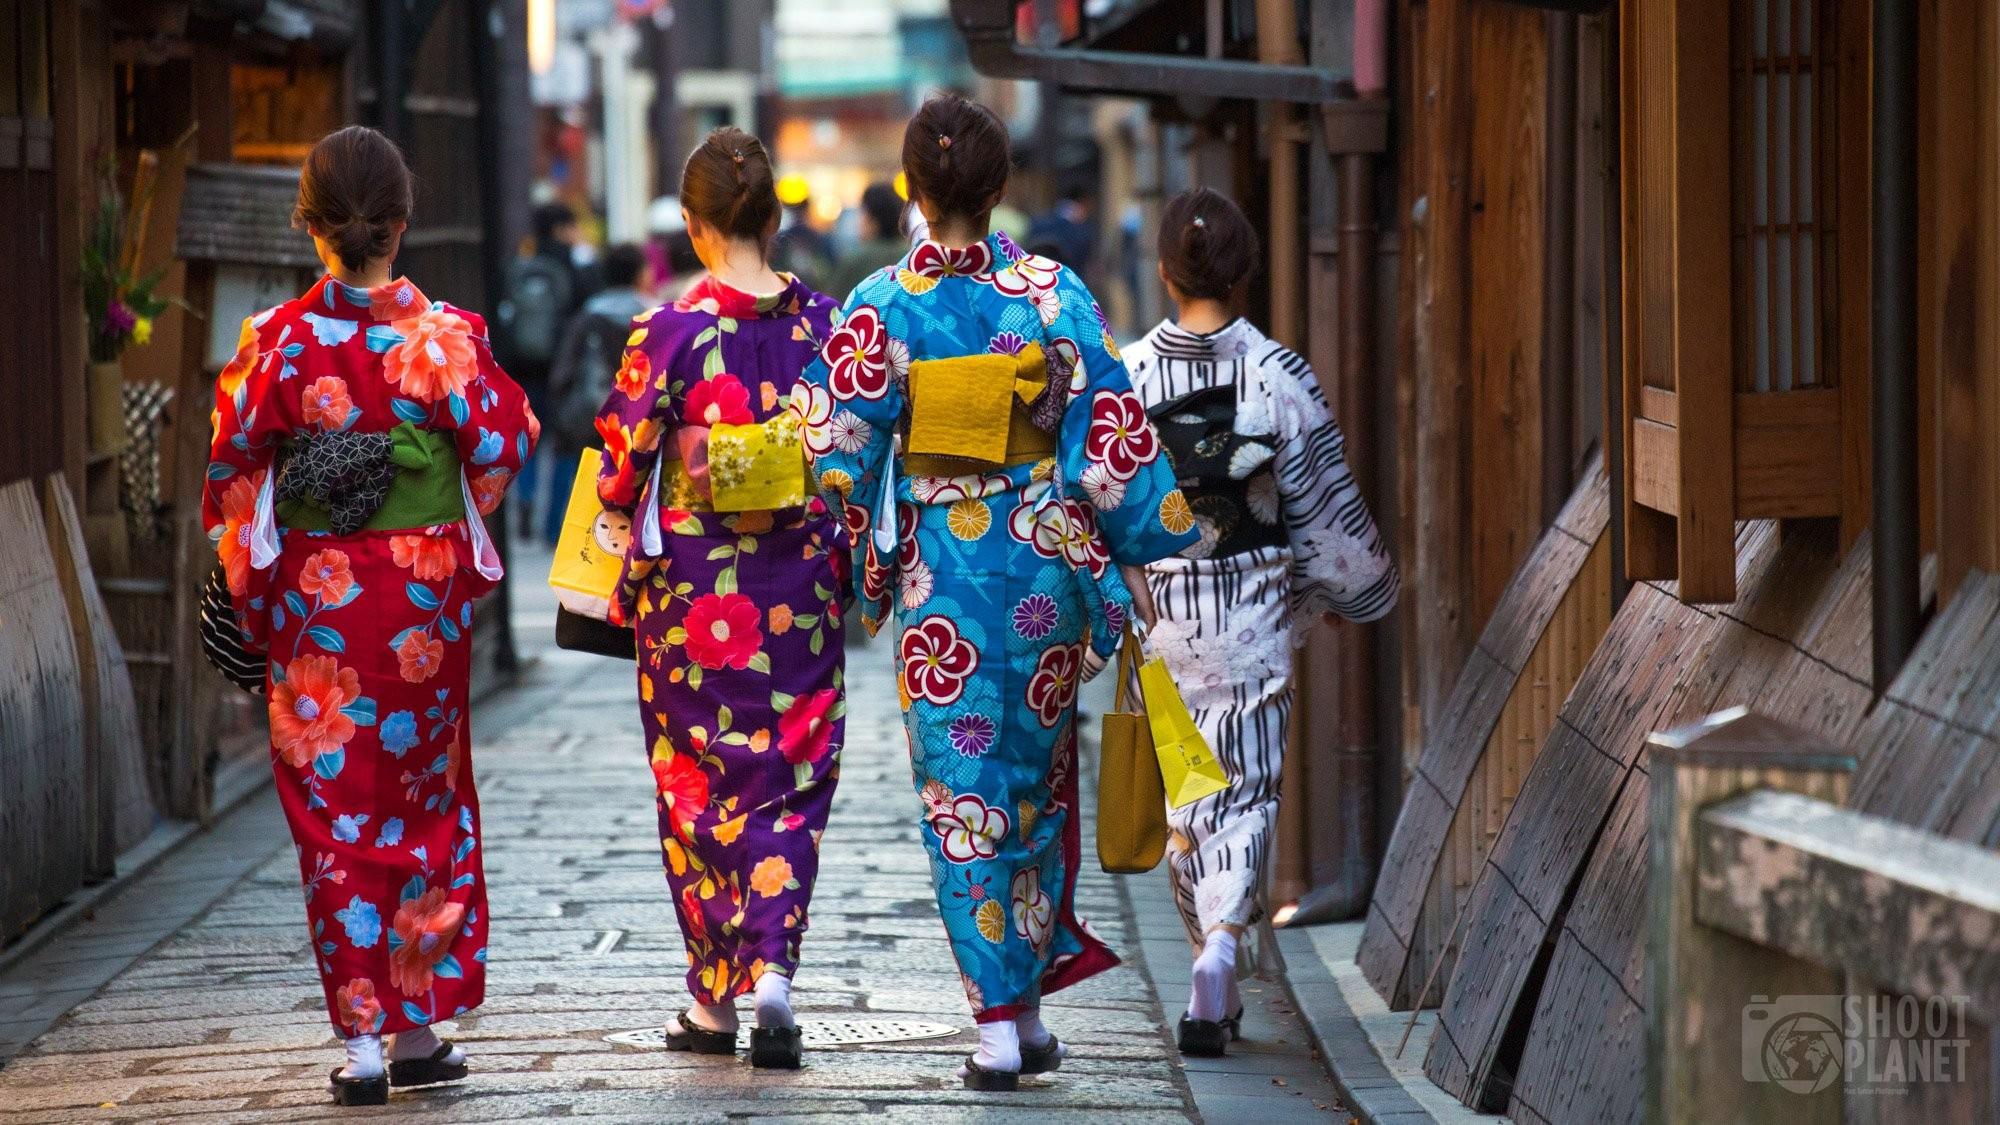 Japanese women in traditional kimonos, Kyoto